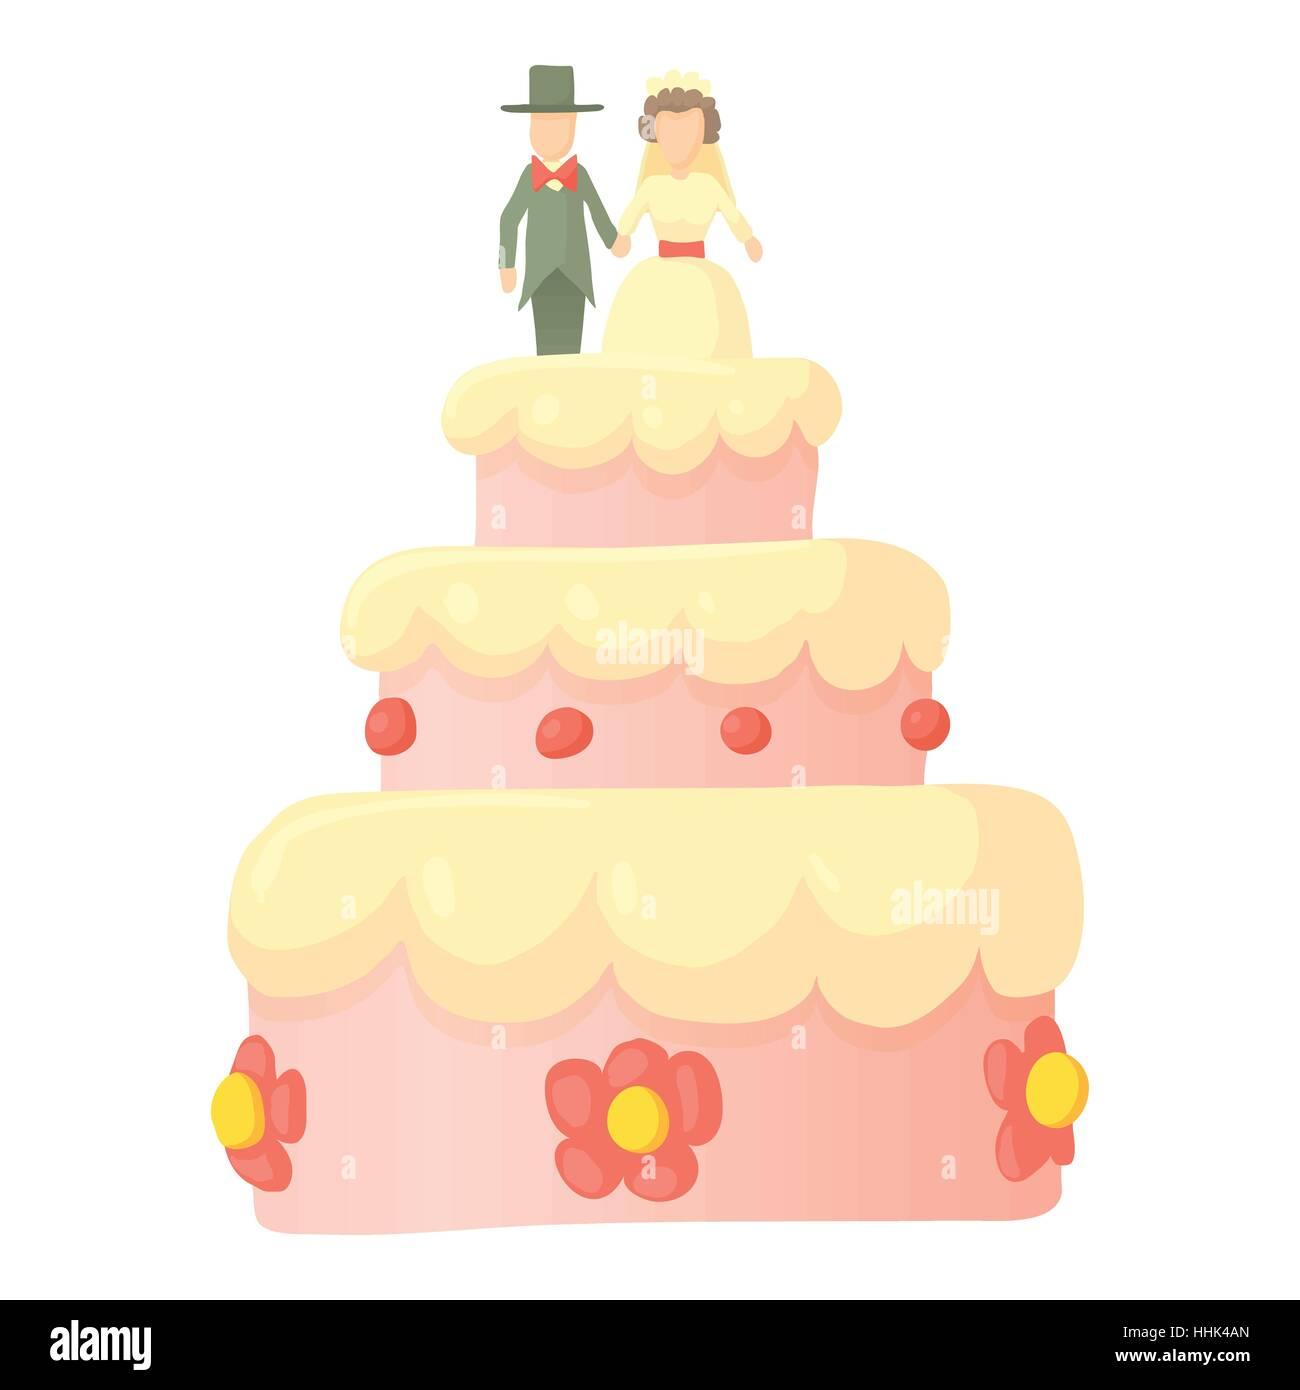 Wedding Cake Figures Stock Vector Images - Alamy